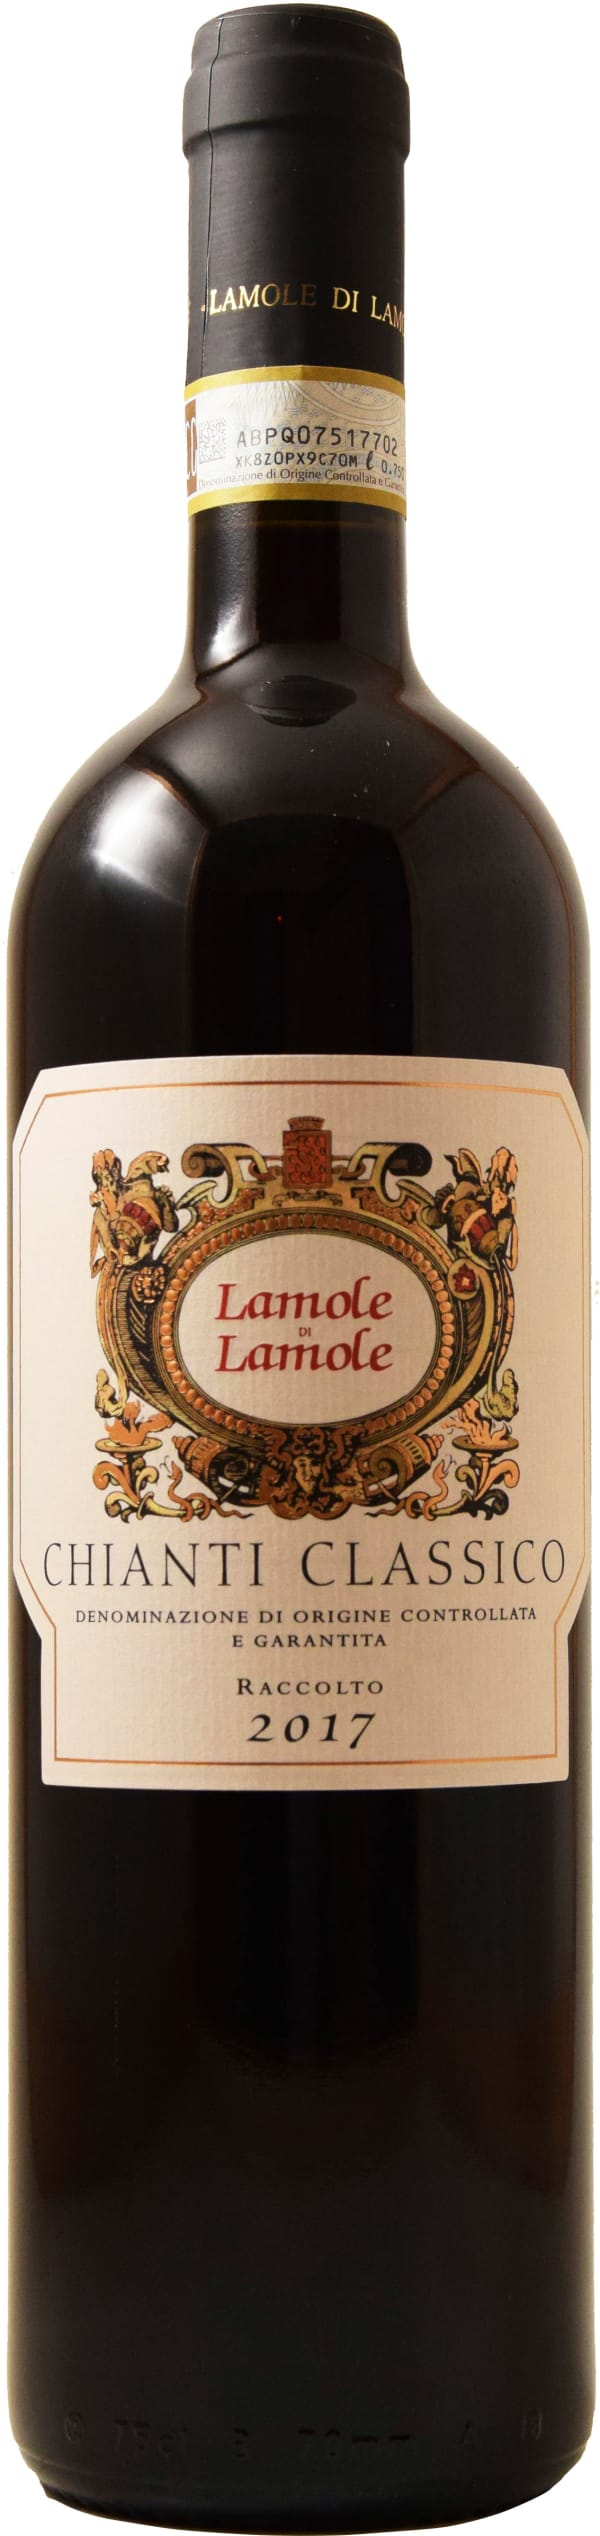 Lamole di Lamole Chianti Classico 2016